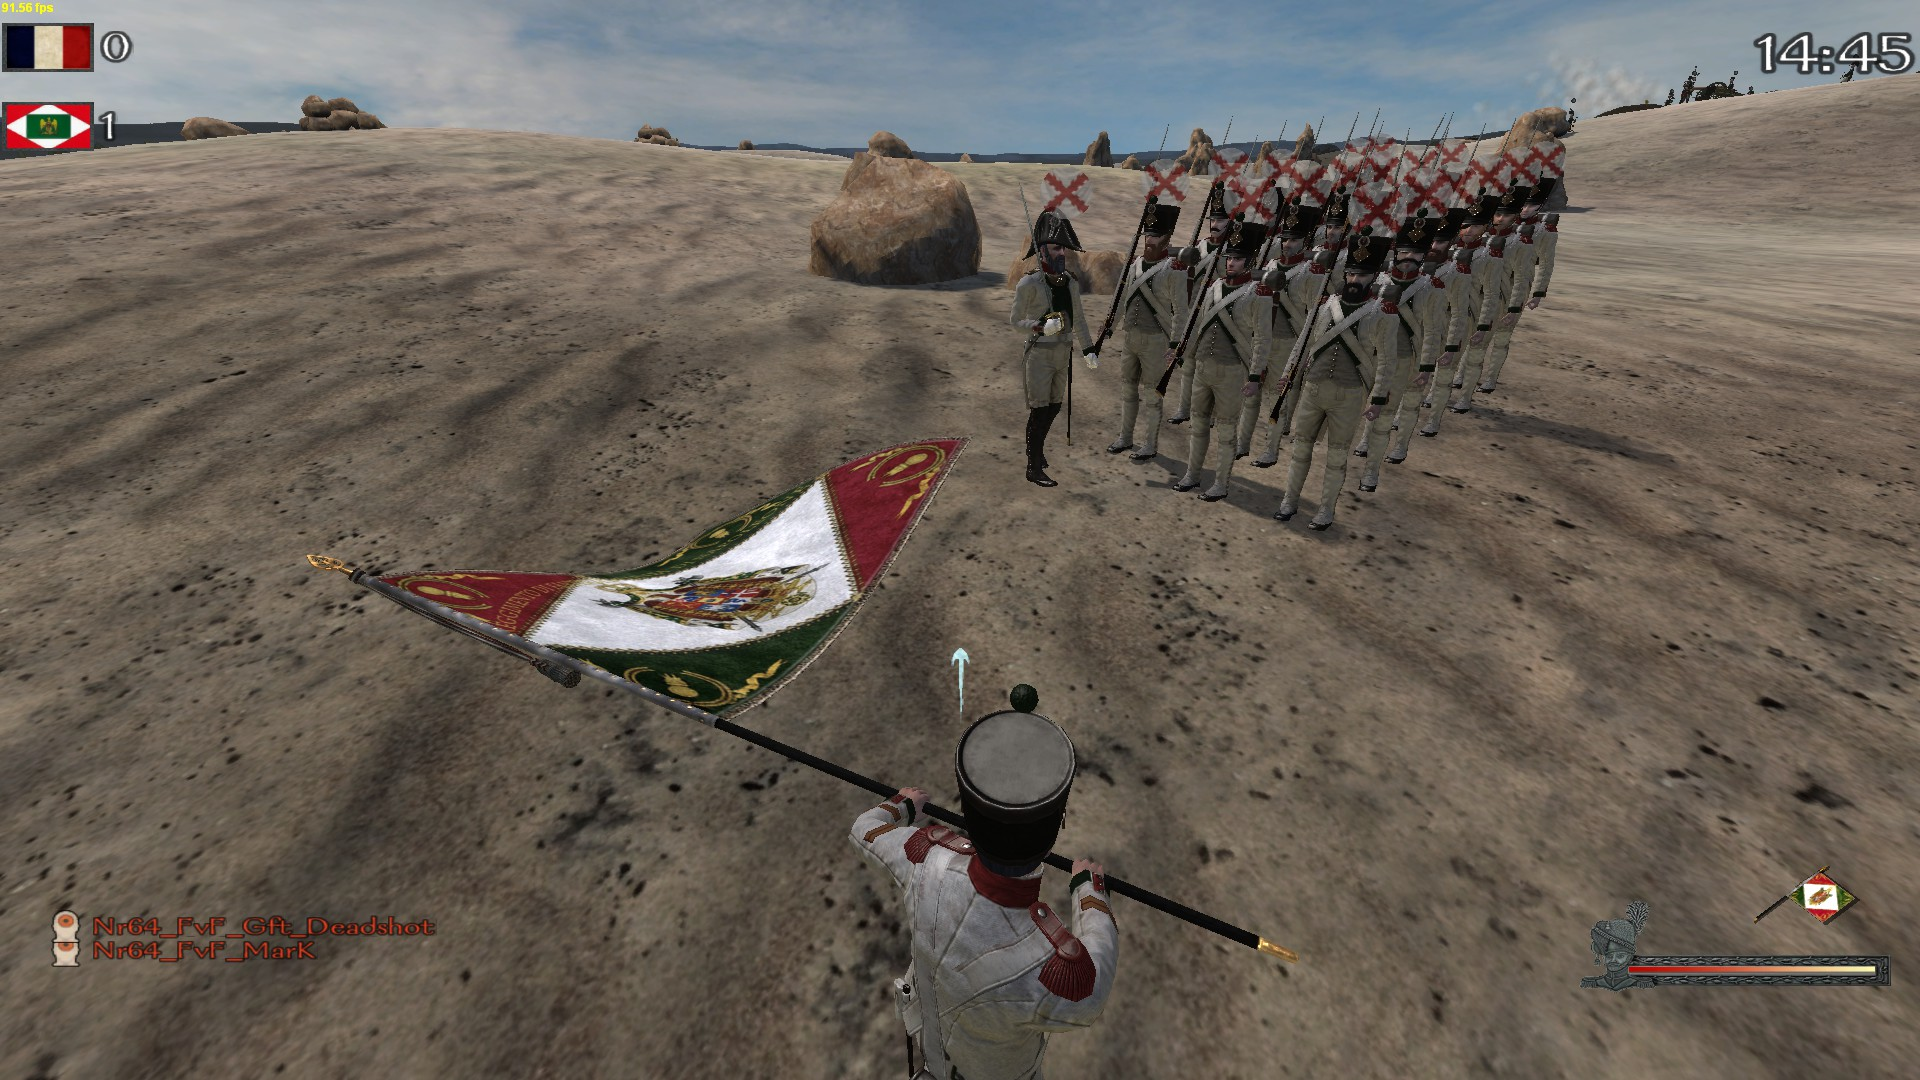 2a Brigada Hispana ~ 2aBH 4A19E5705AD577196B2307AEB7AC4474F38BF3B5